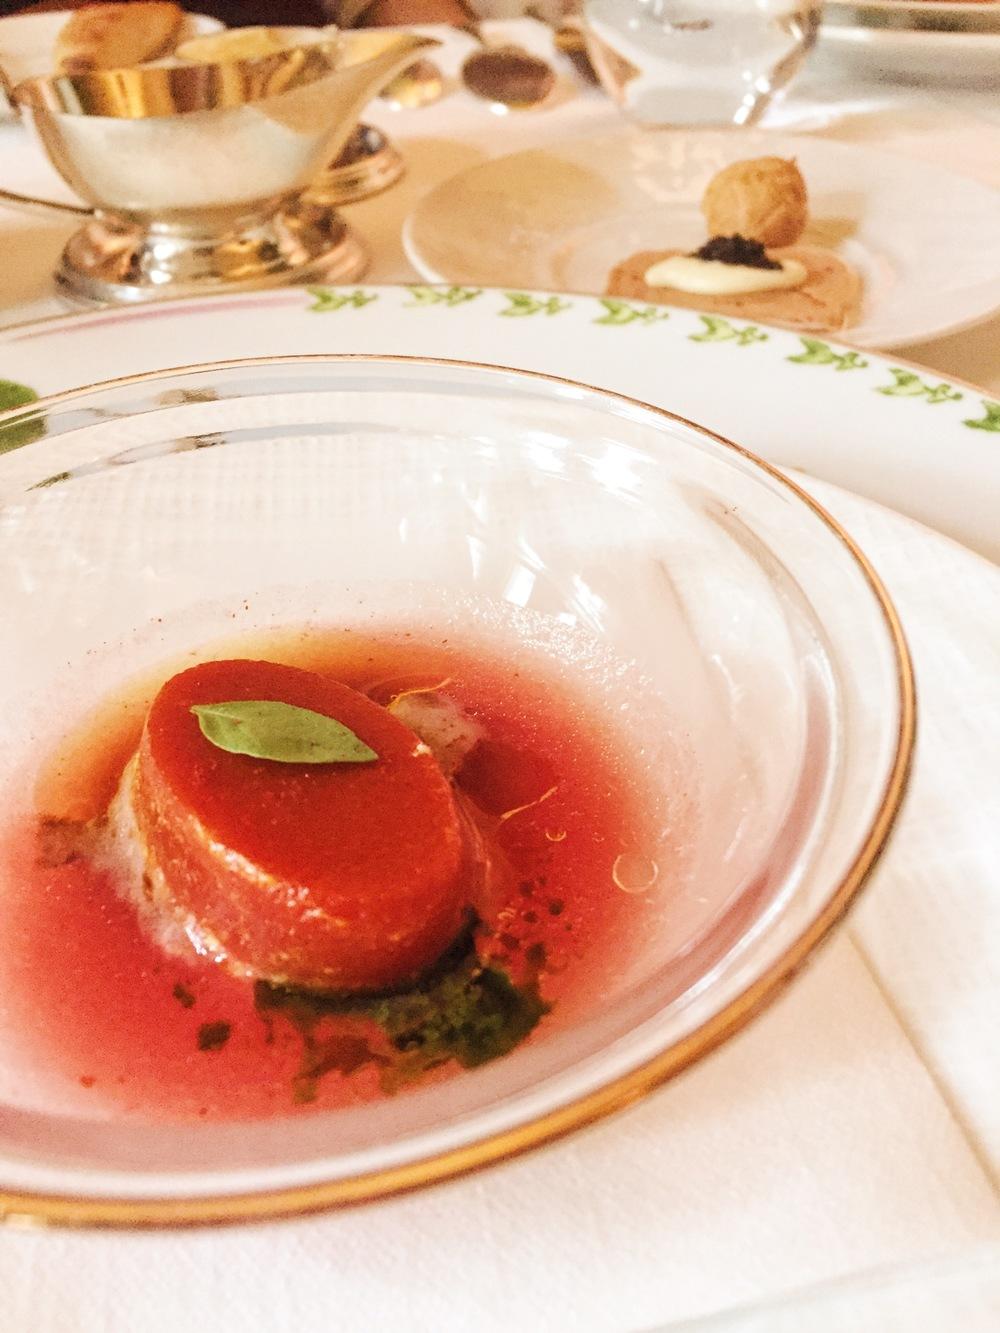 Tomato jelly, foie gras and caviar cracker